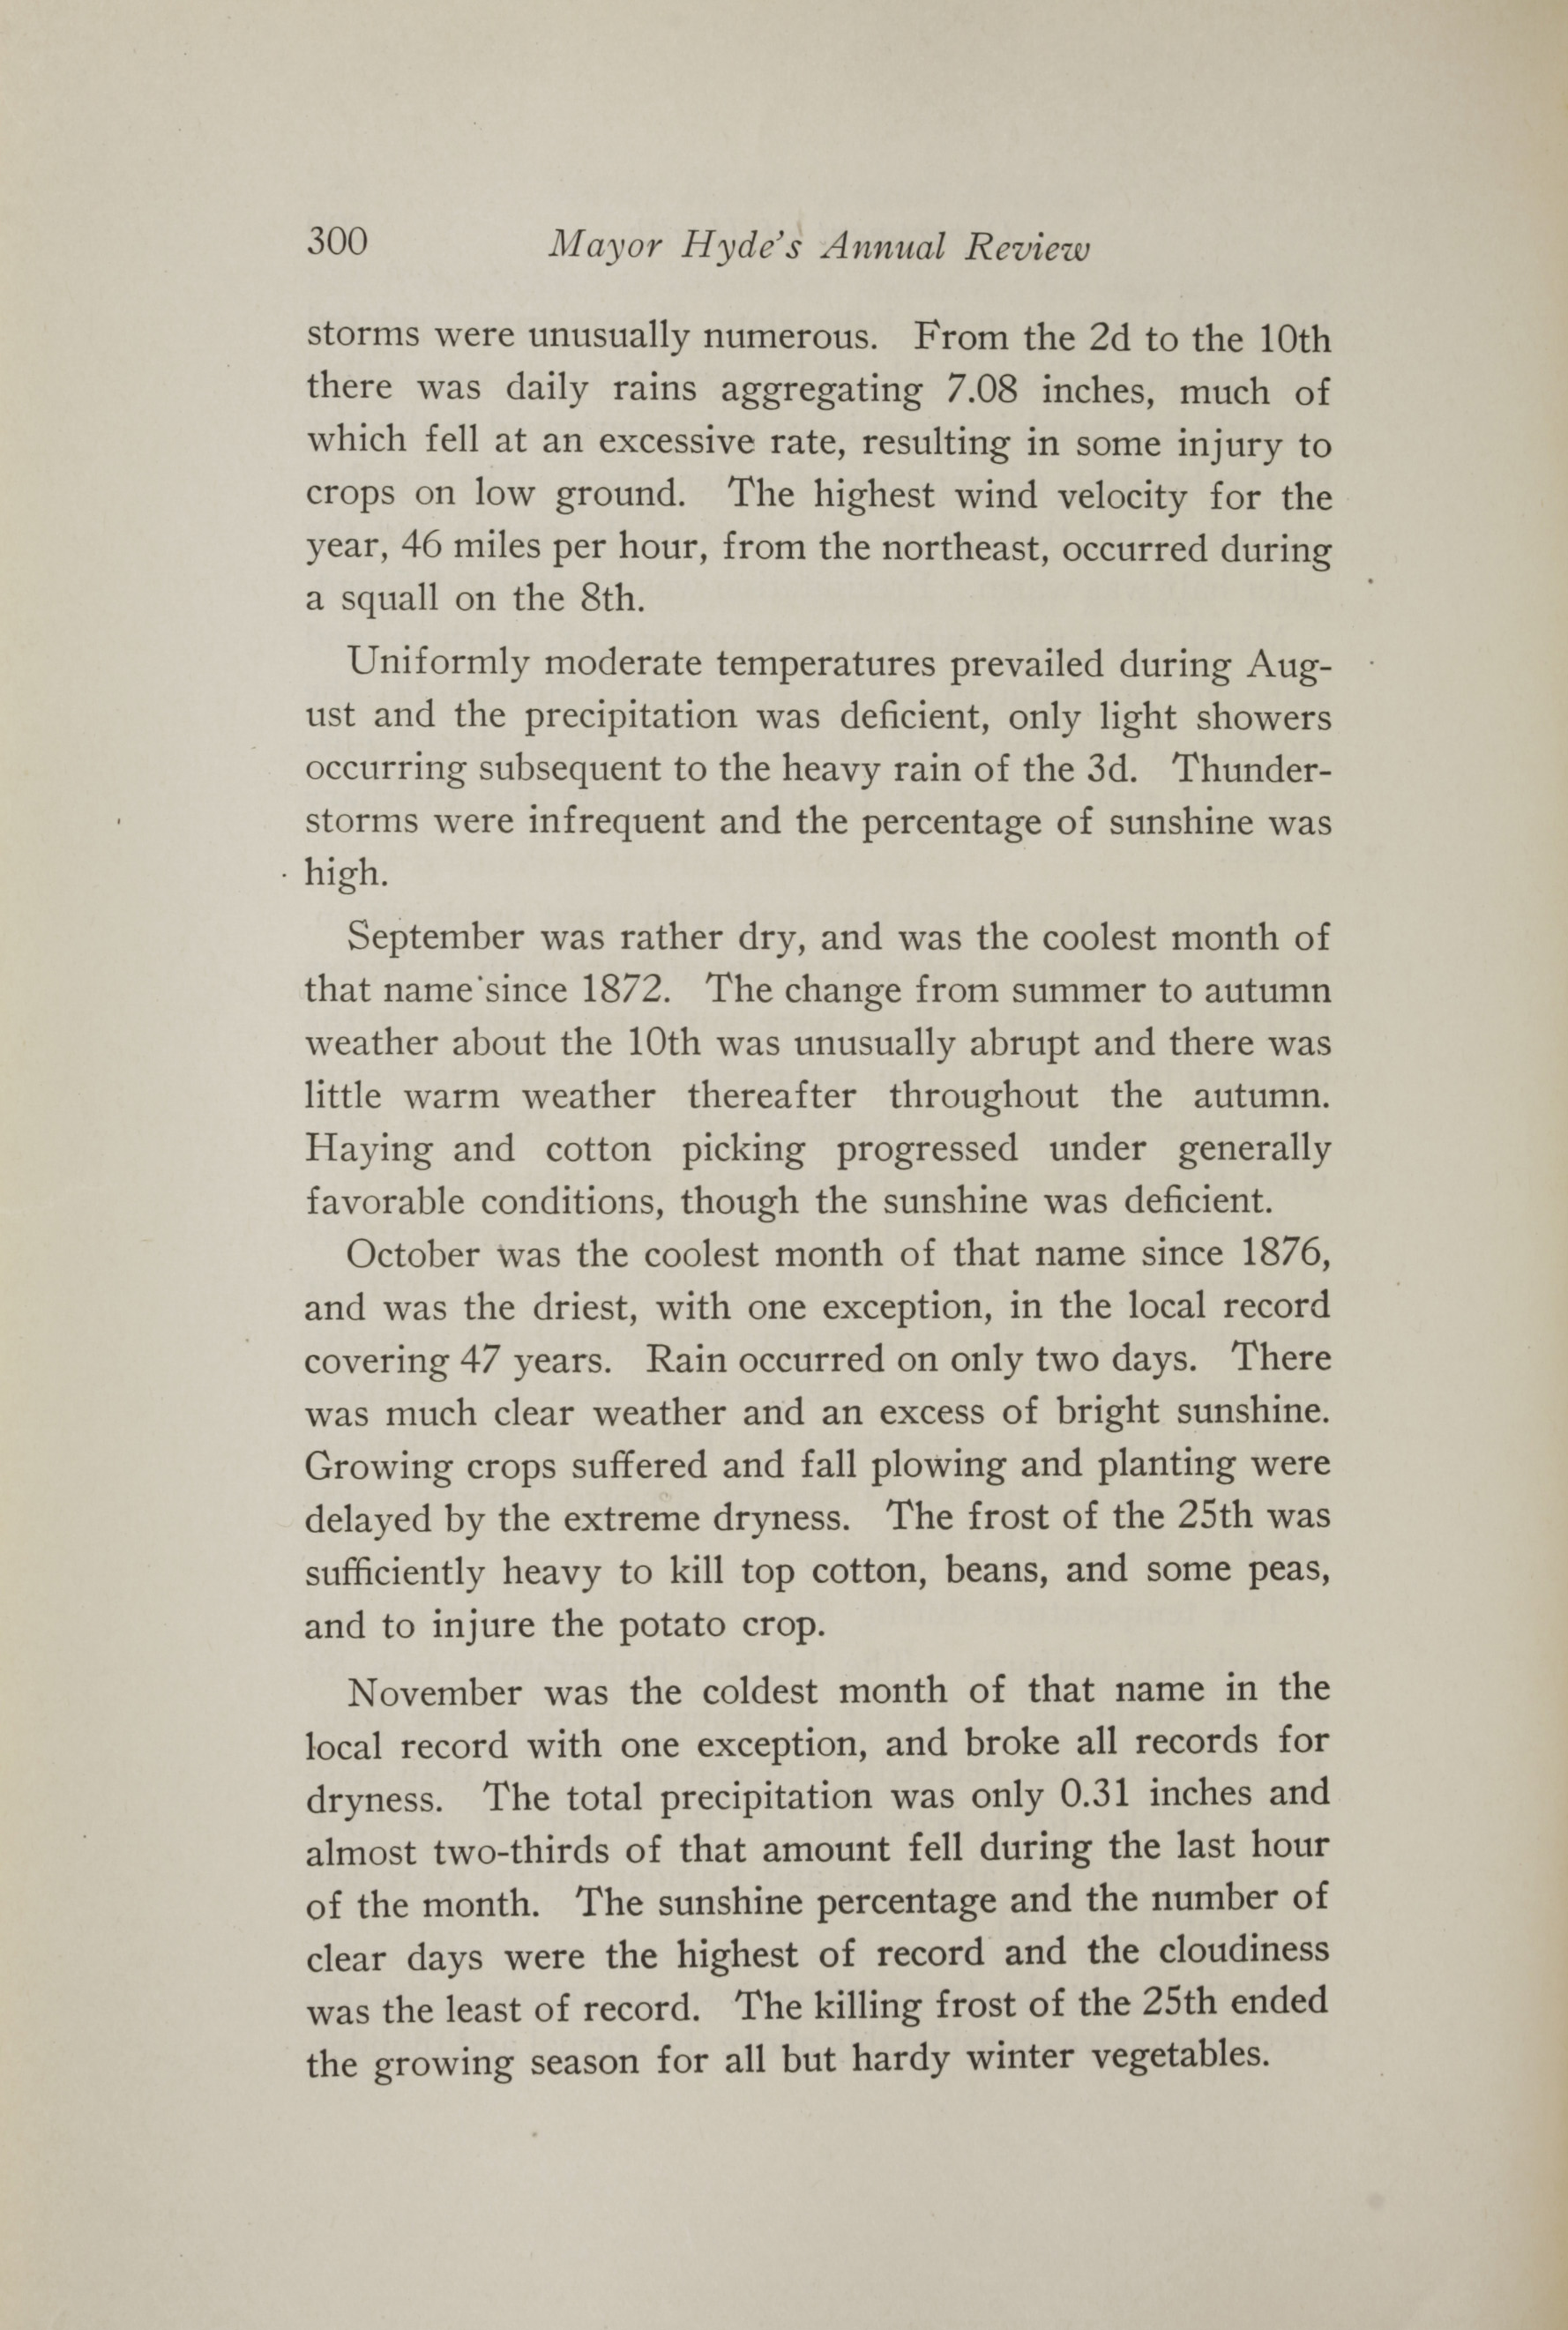 Charleston Yearbook, 1917, page 300